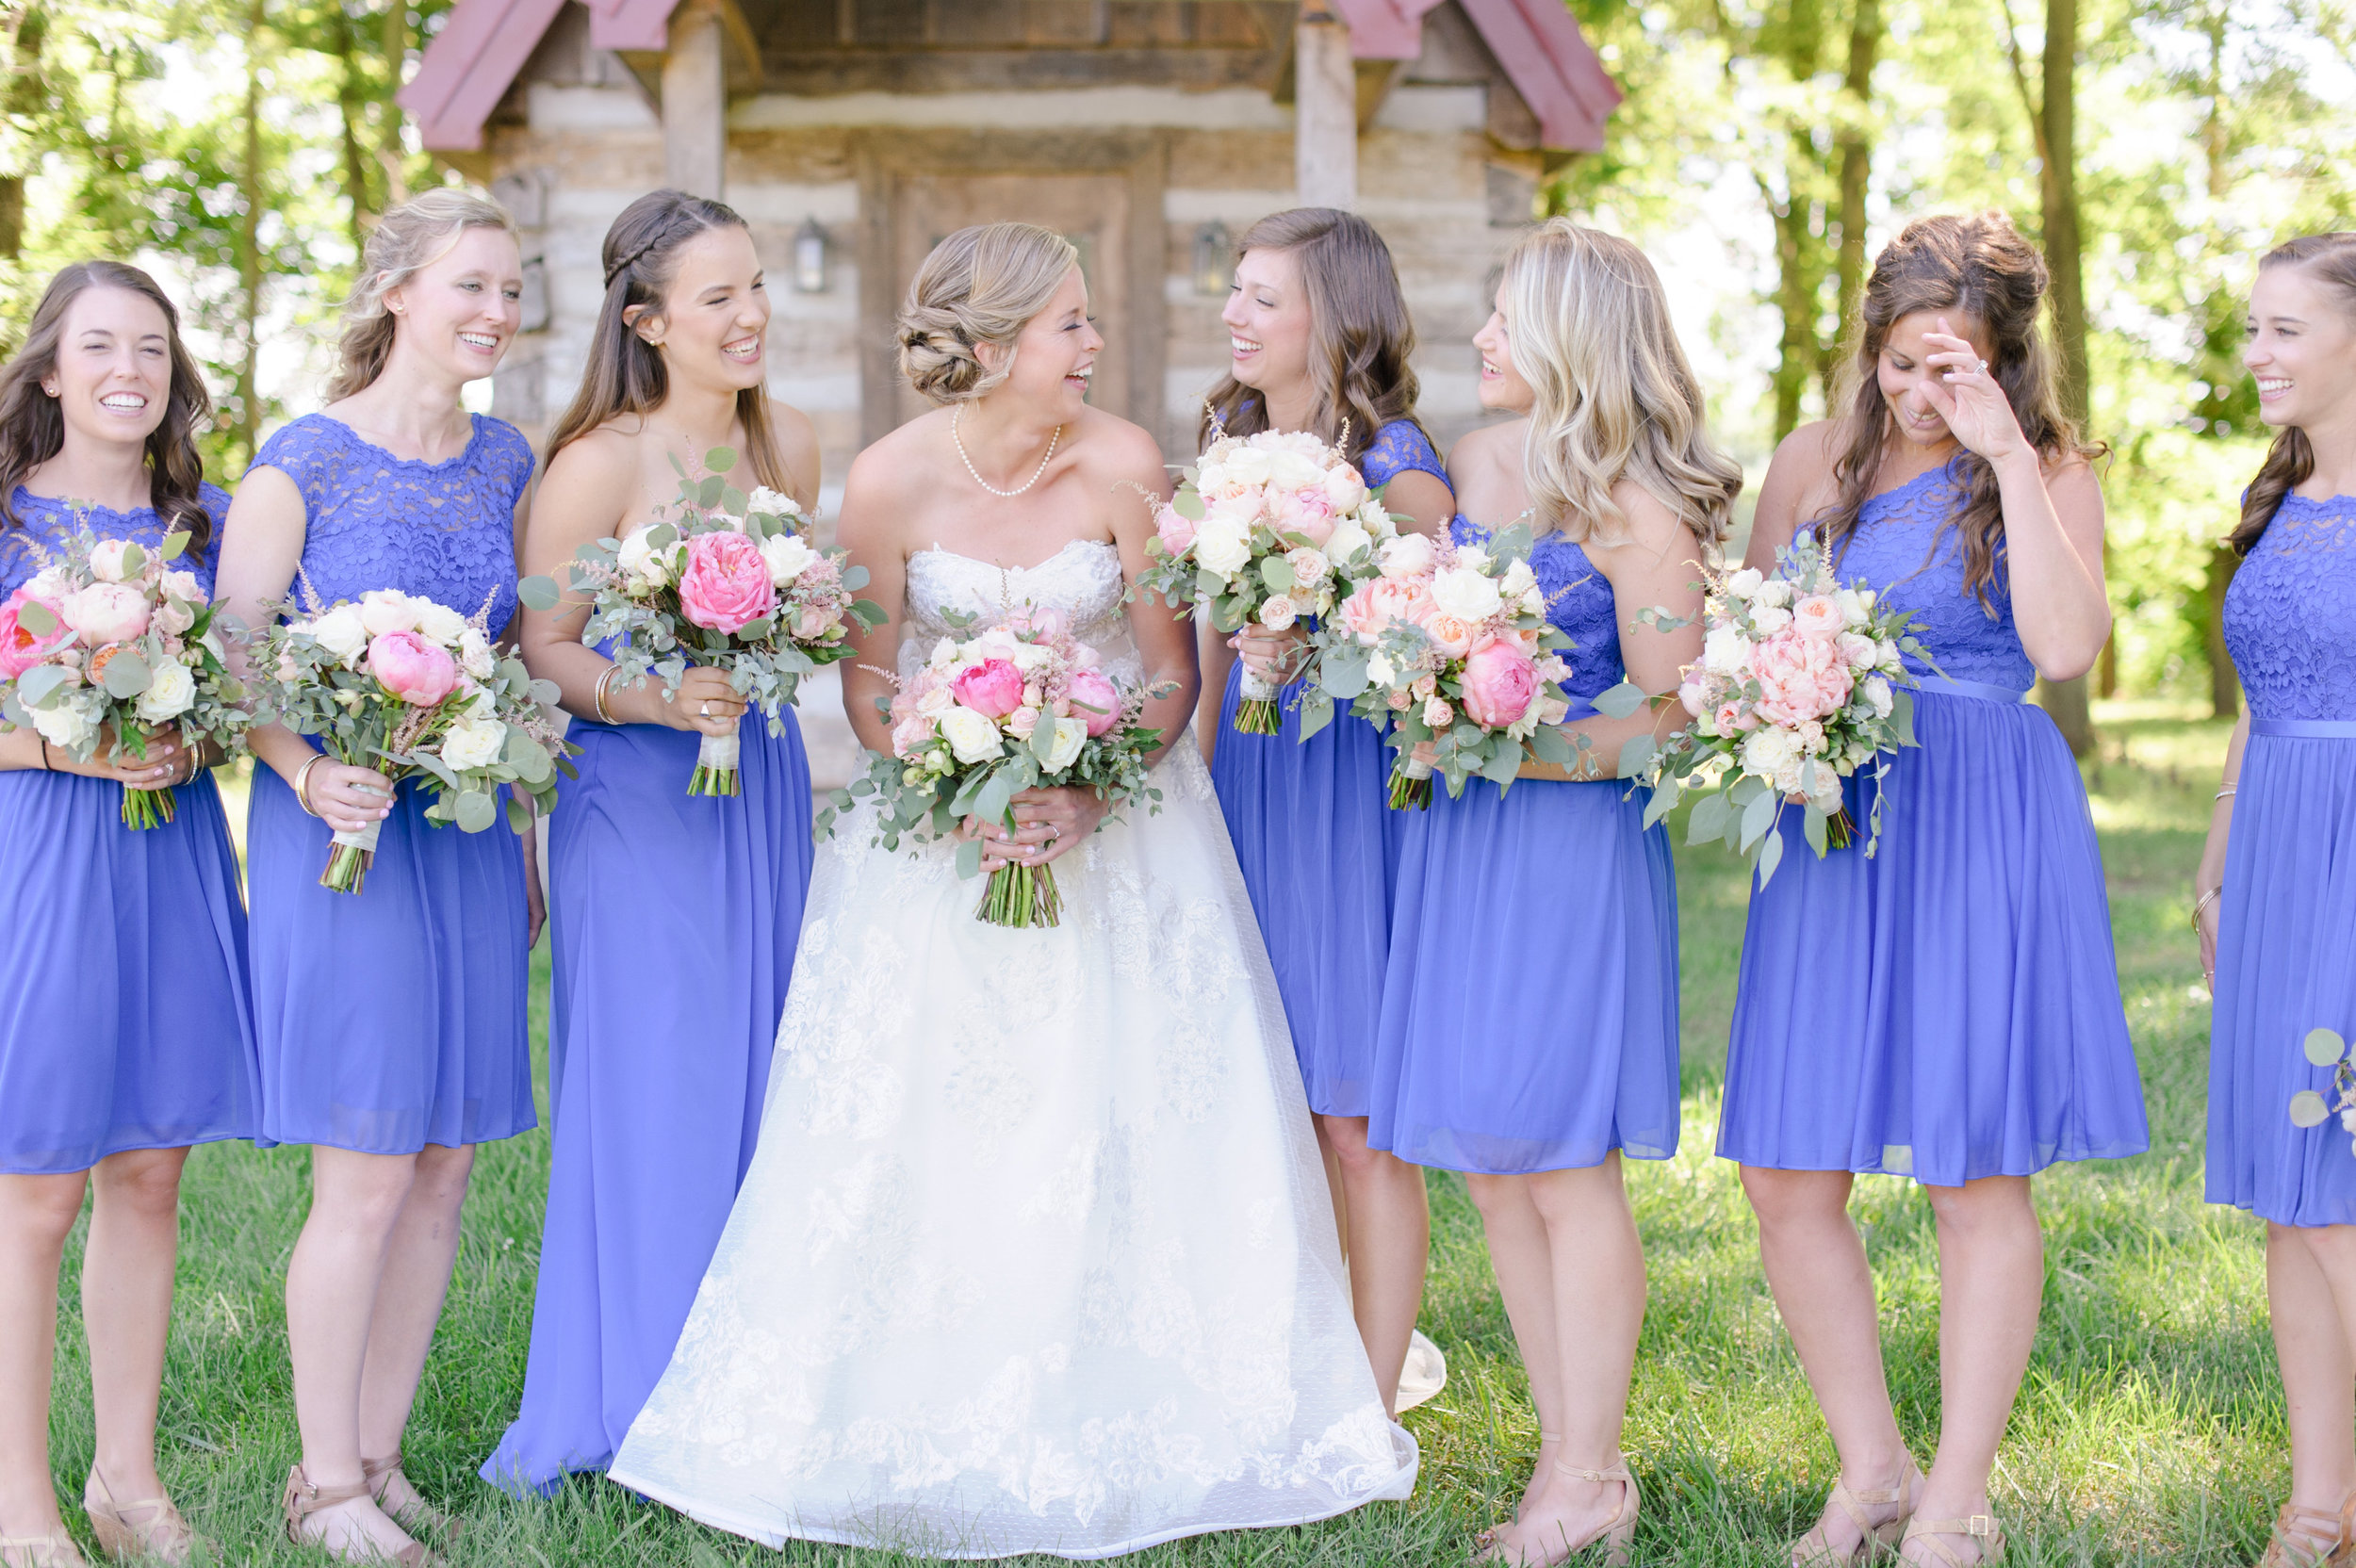 Shane Kelly Married-Bridal Party Portraits-0034.jpg